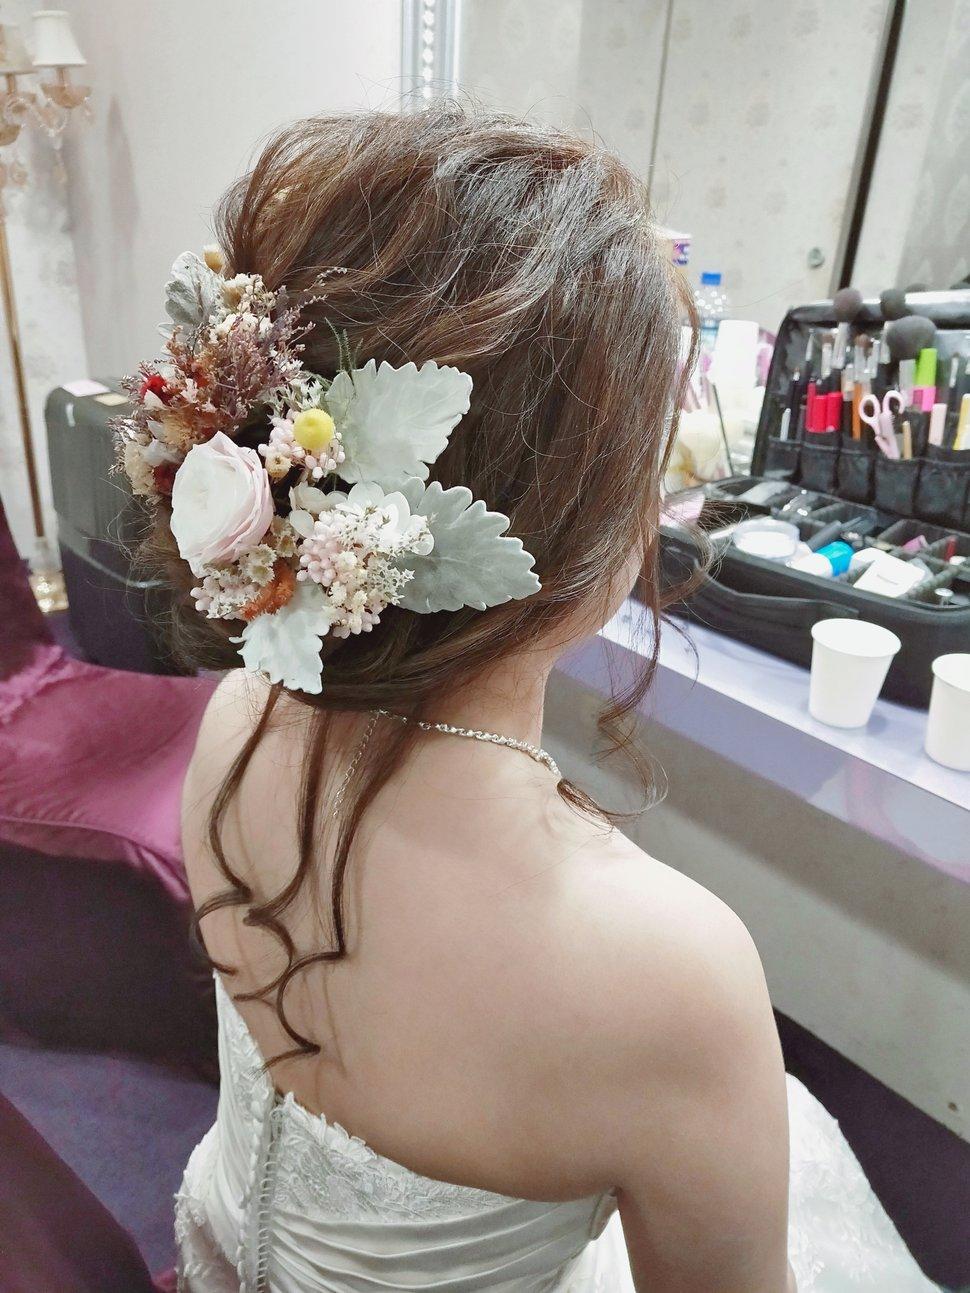 IMG_20181201_154059 - Elaine makeup《結婚吧》